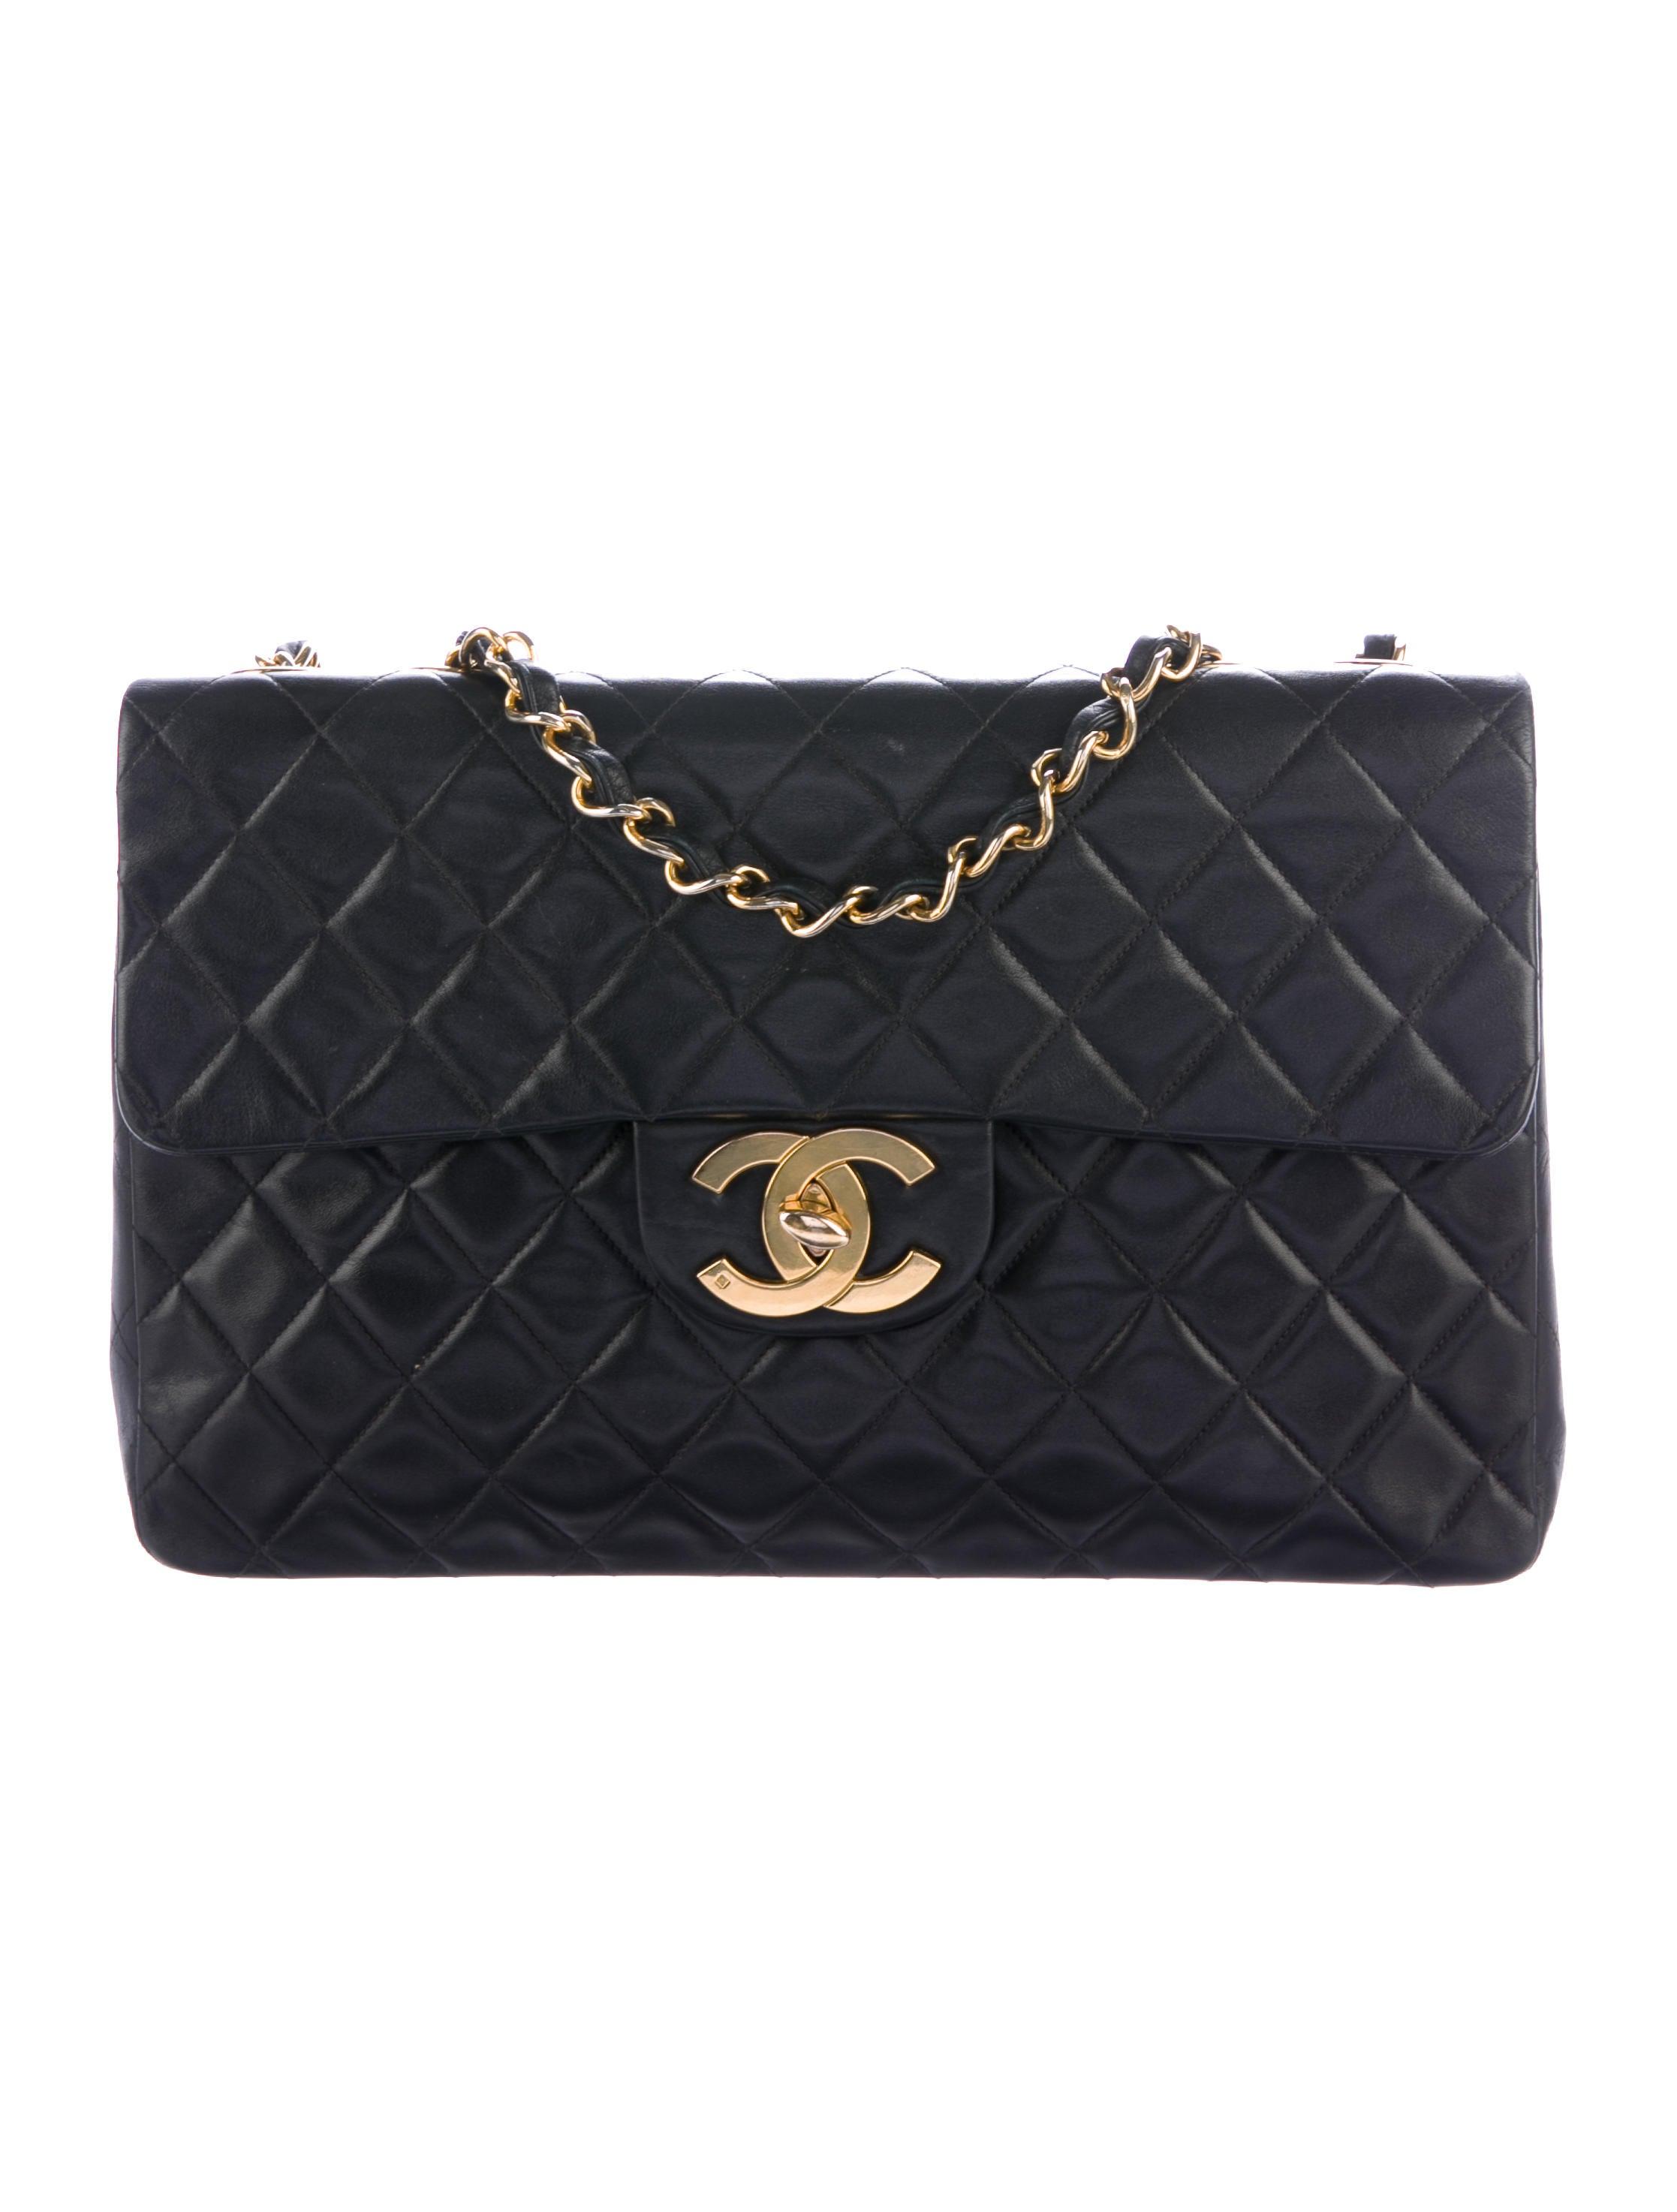 Chanel Väskor Vintage : Chanel vintage classic maxi single flap bag handbags